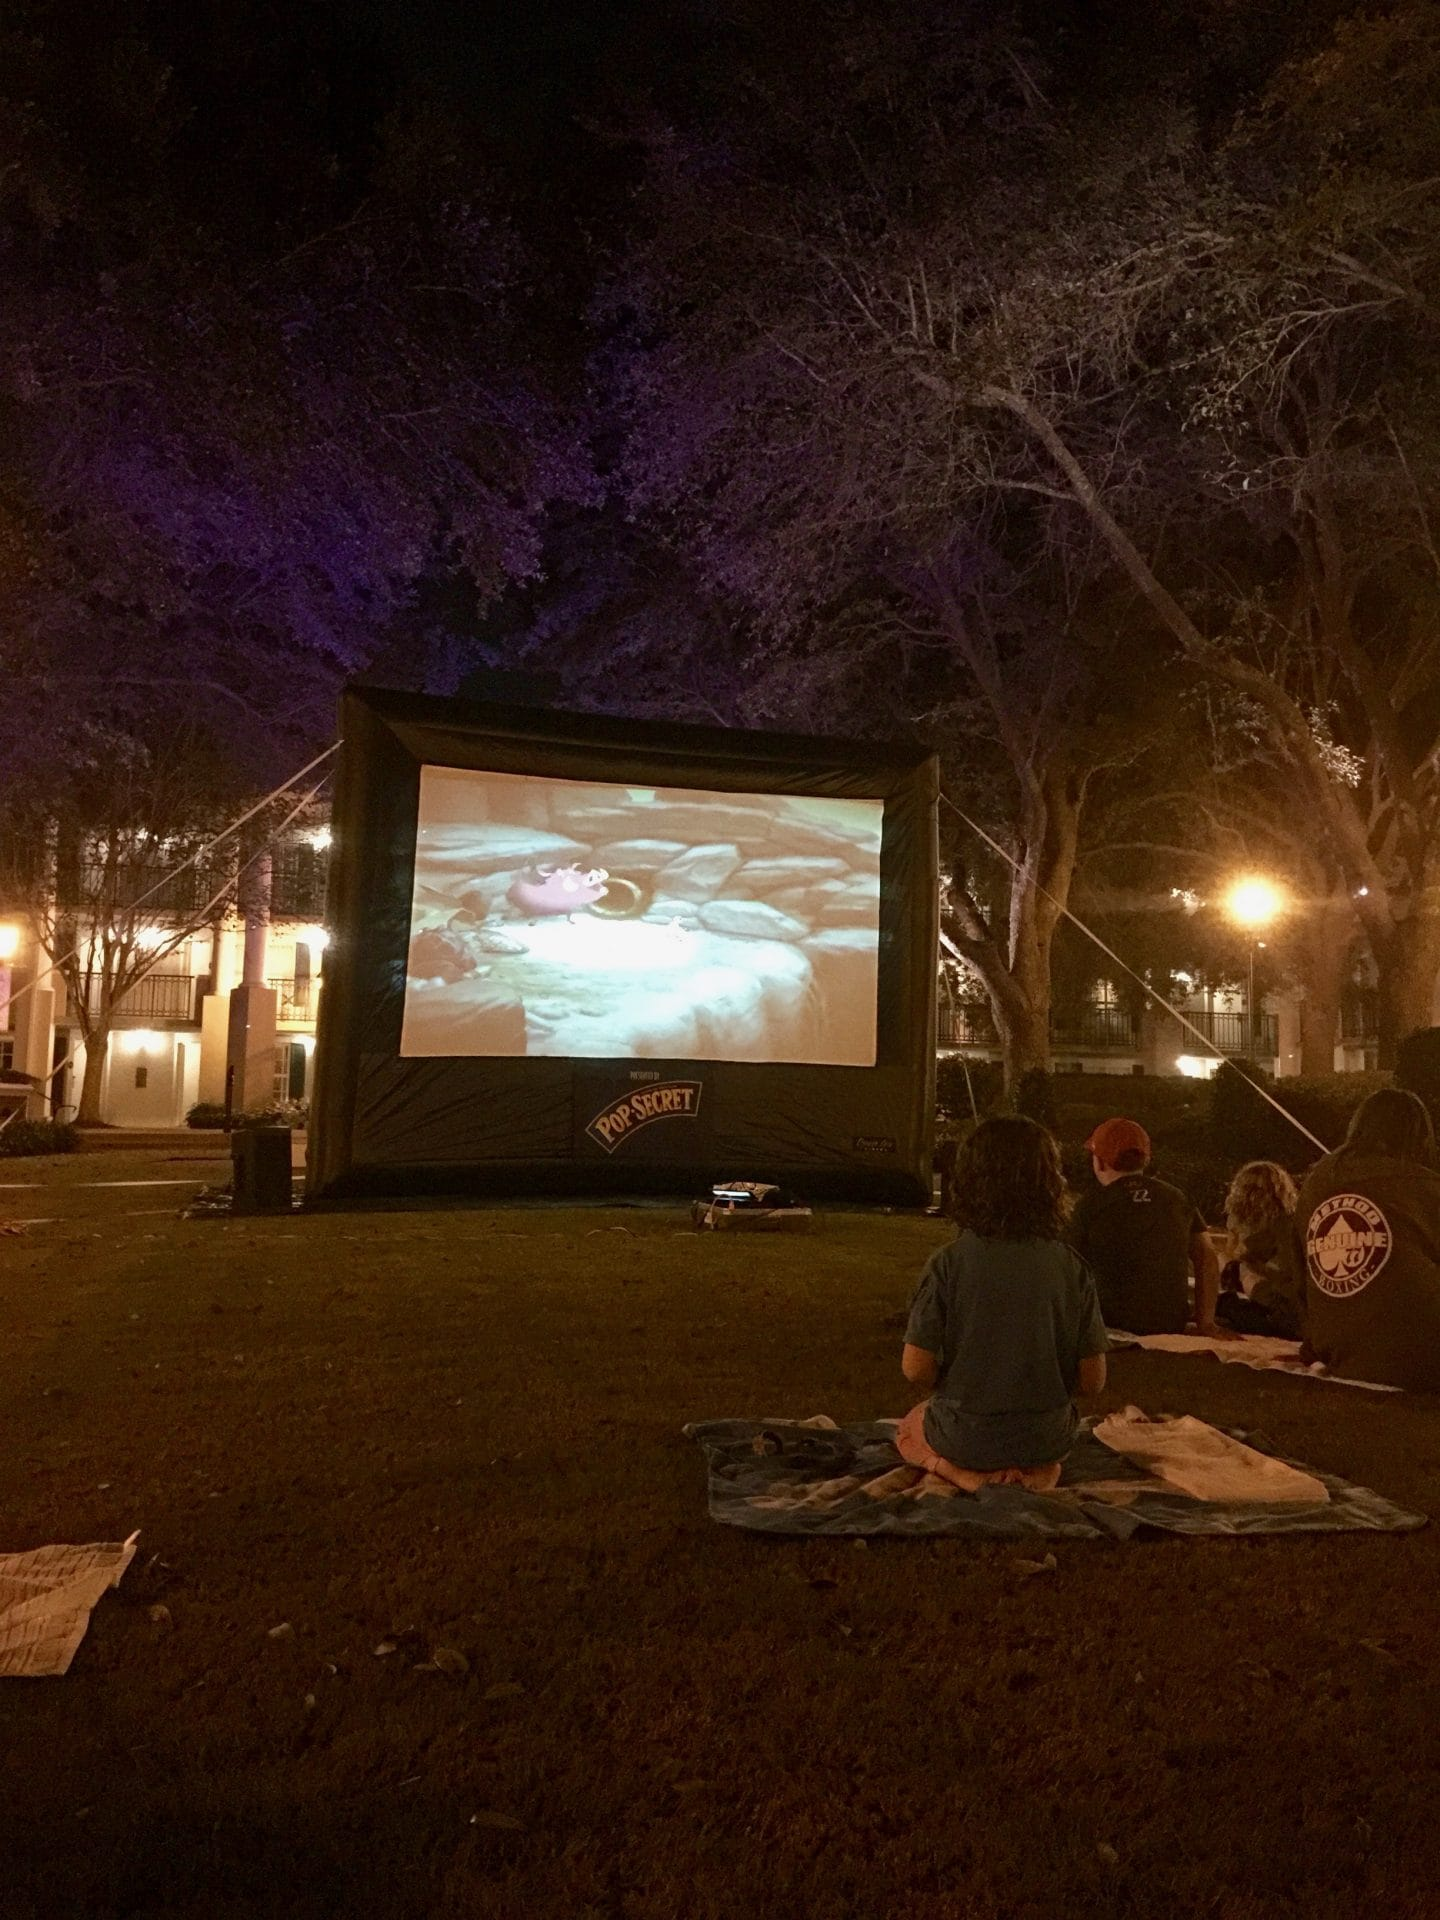 movie under the stars at Disney's port Orleans riverside